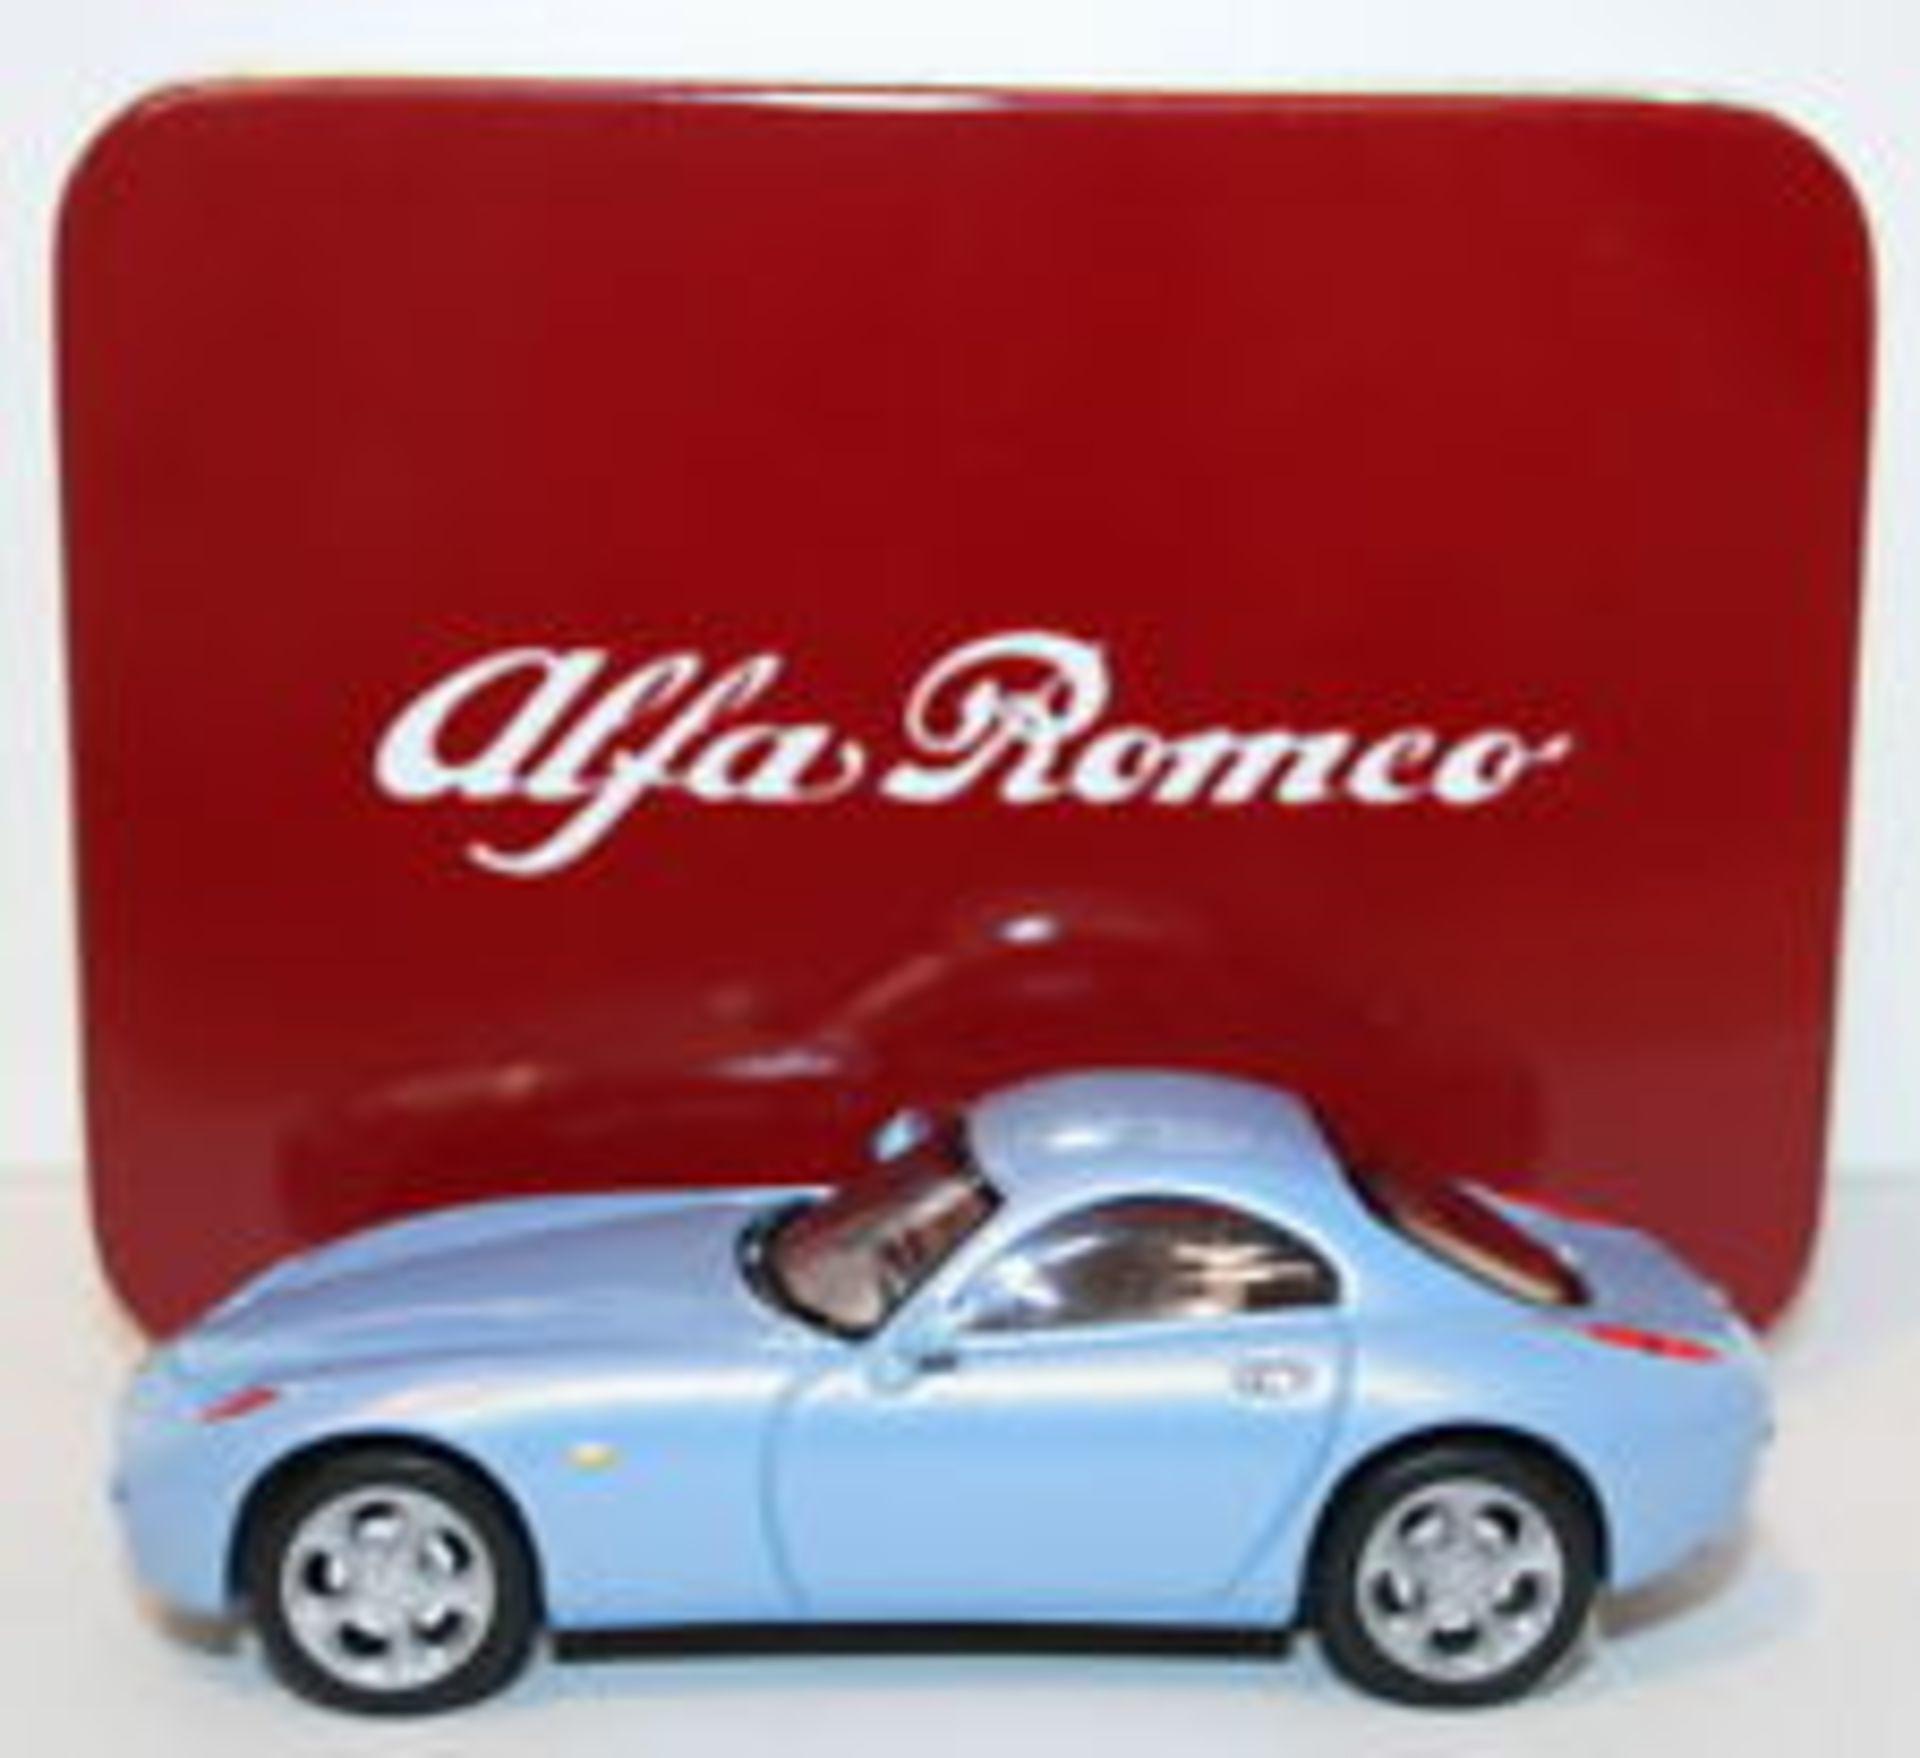 Lot 10382 - V Brand New Alfa Romeo 166 Die Cast Model Car - Colours May Vary